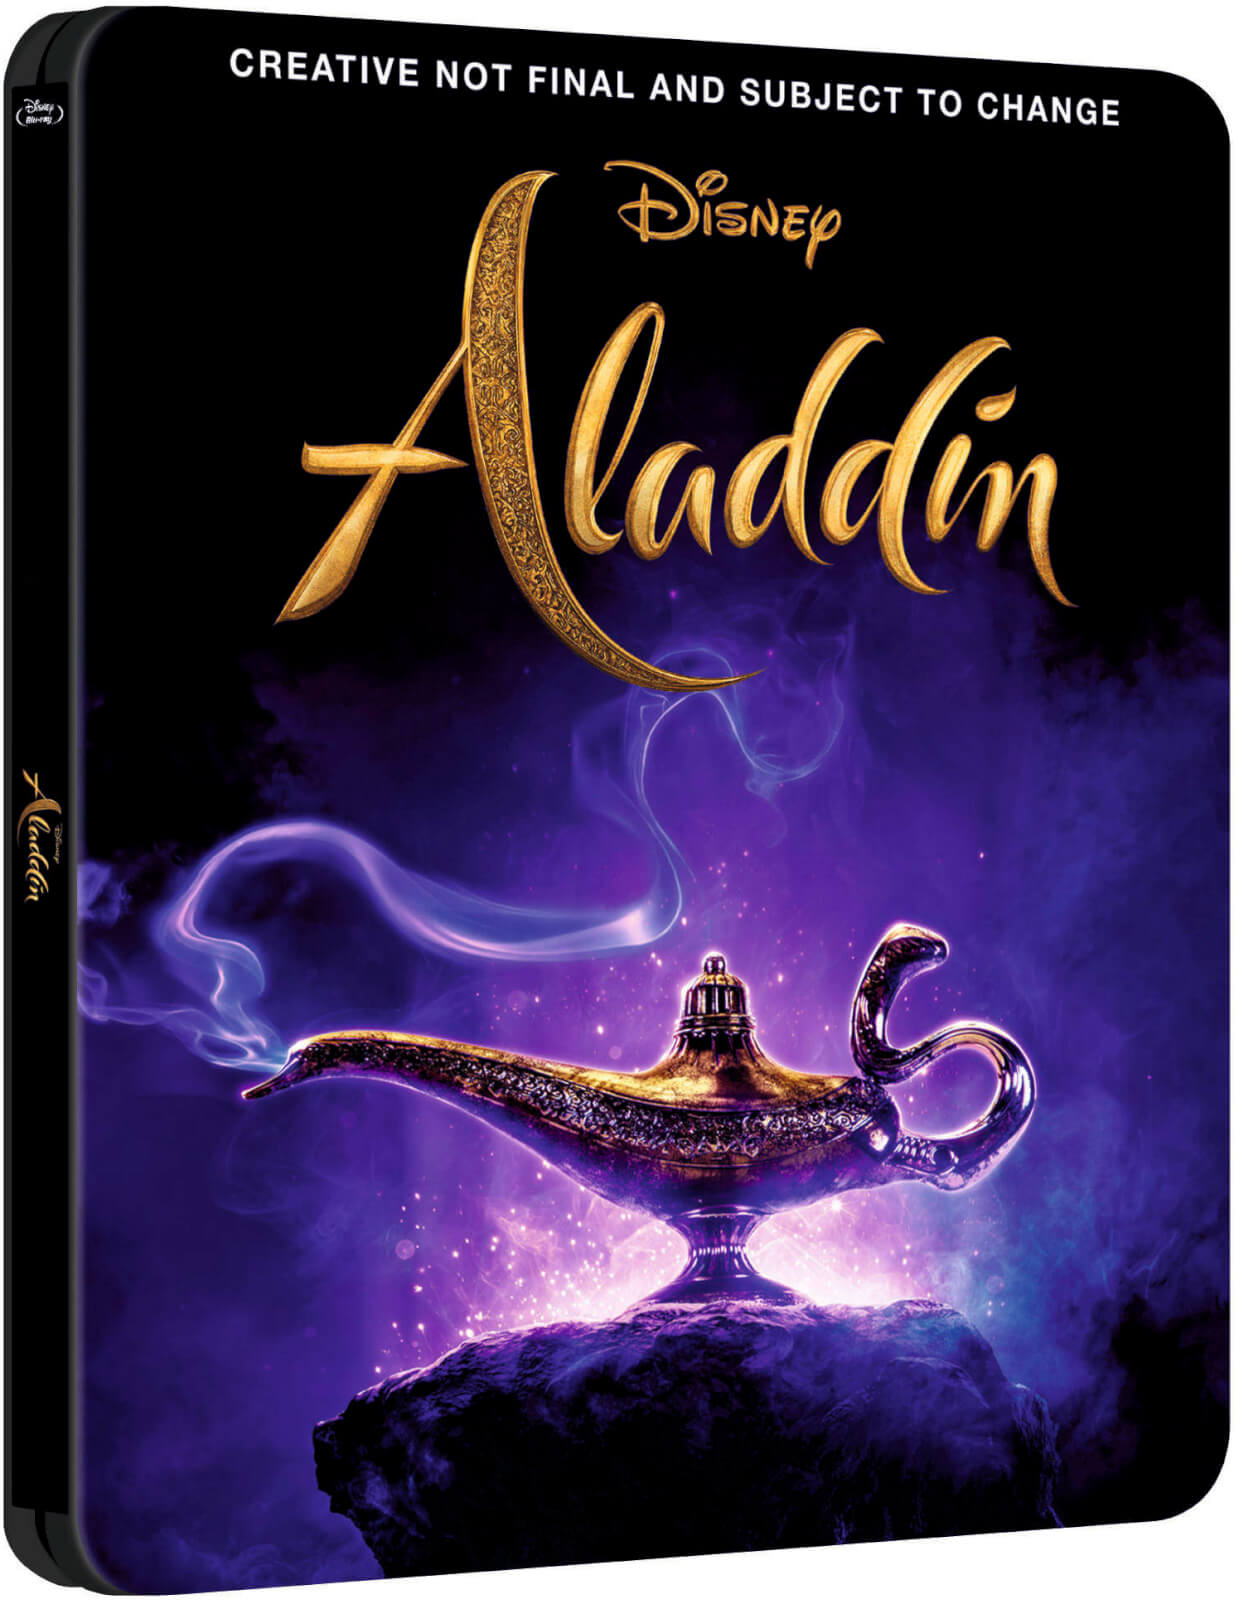 Aladdin (2019) 4k SteelBook front